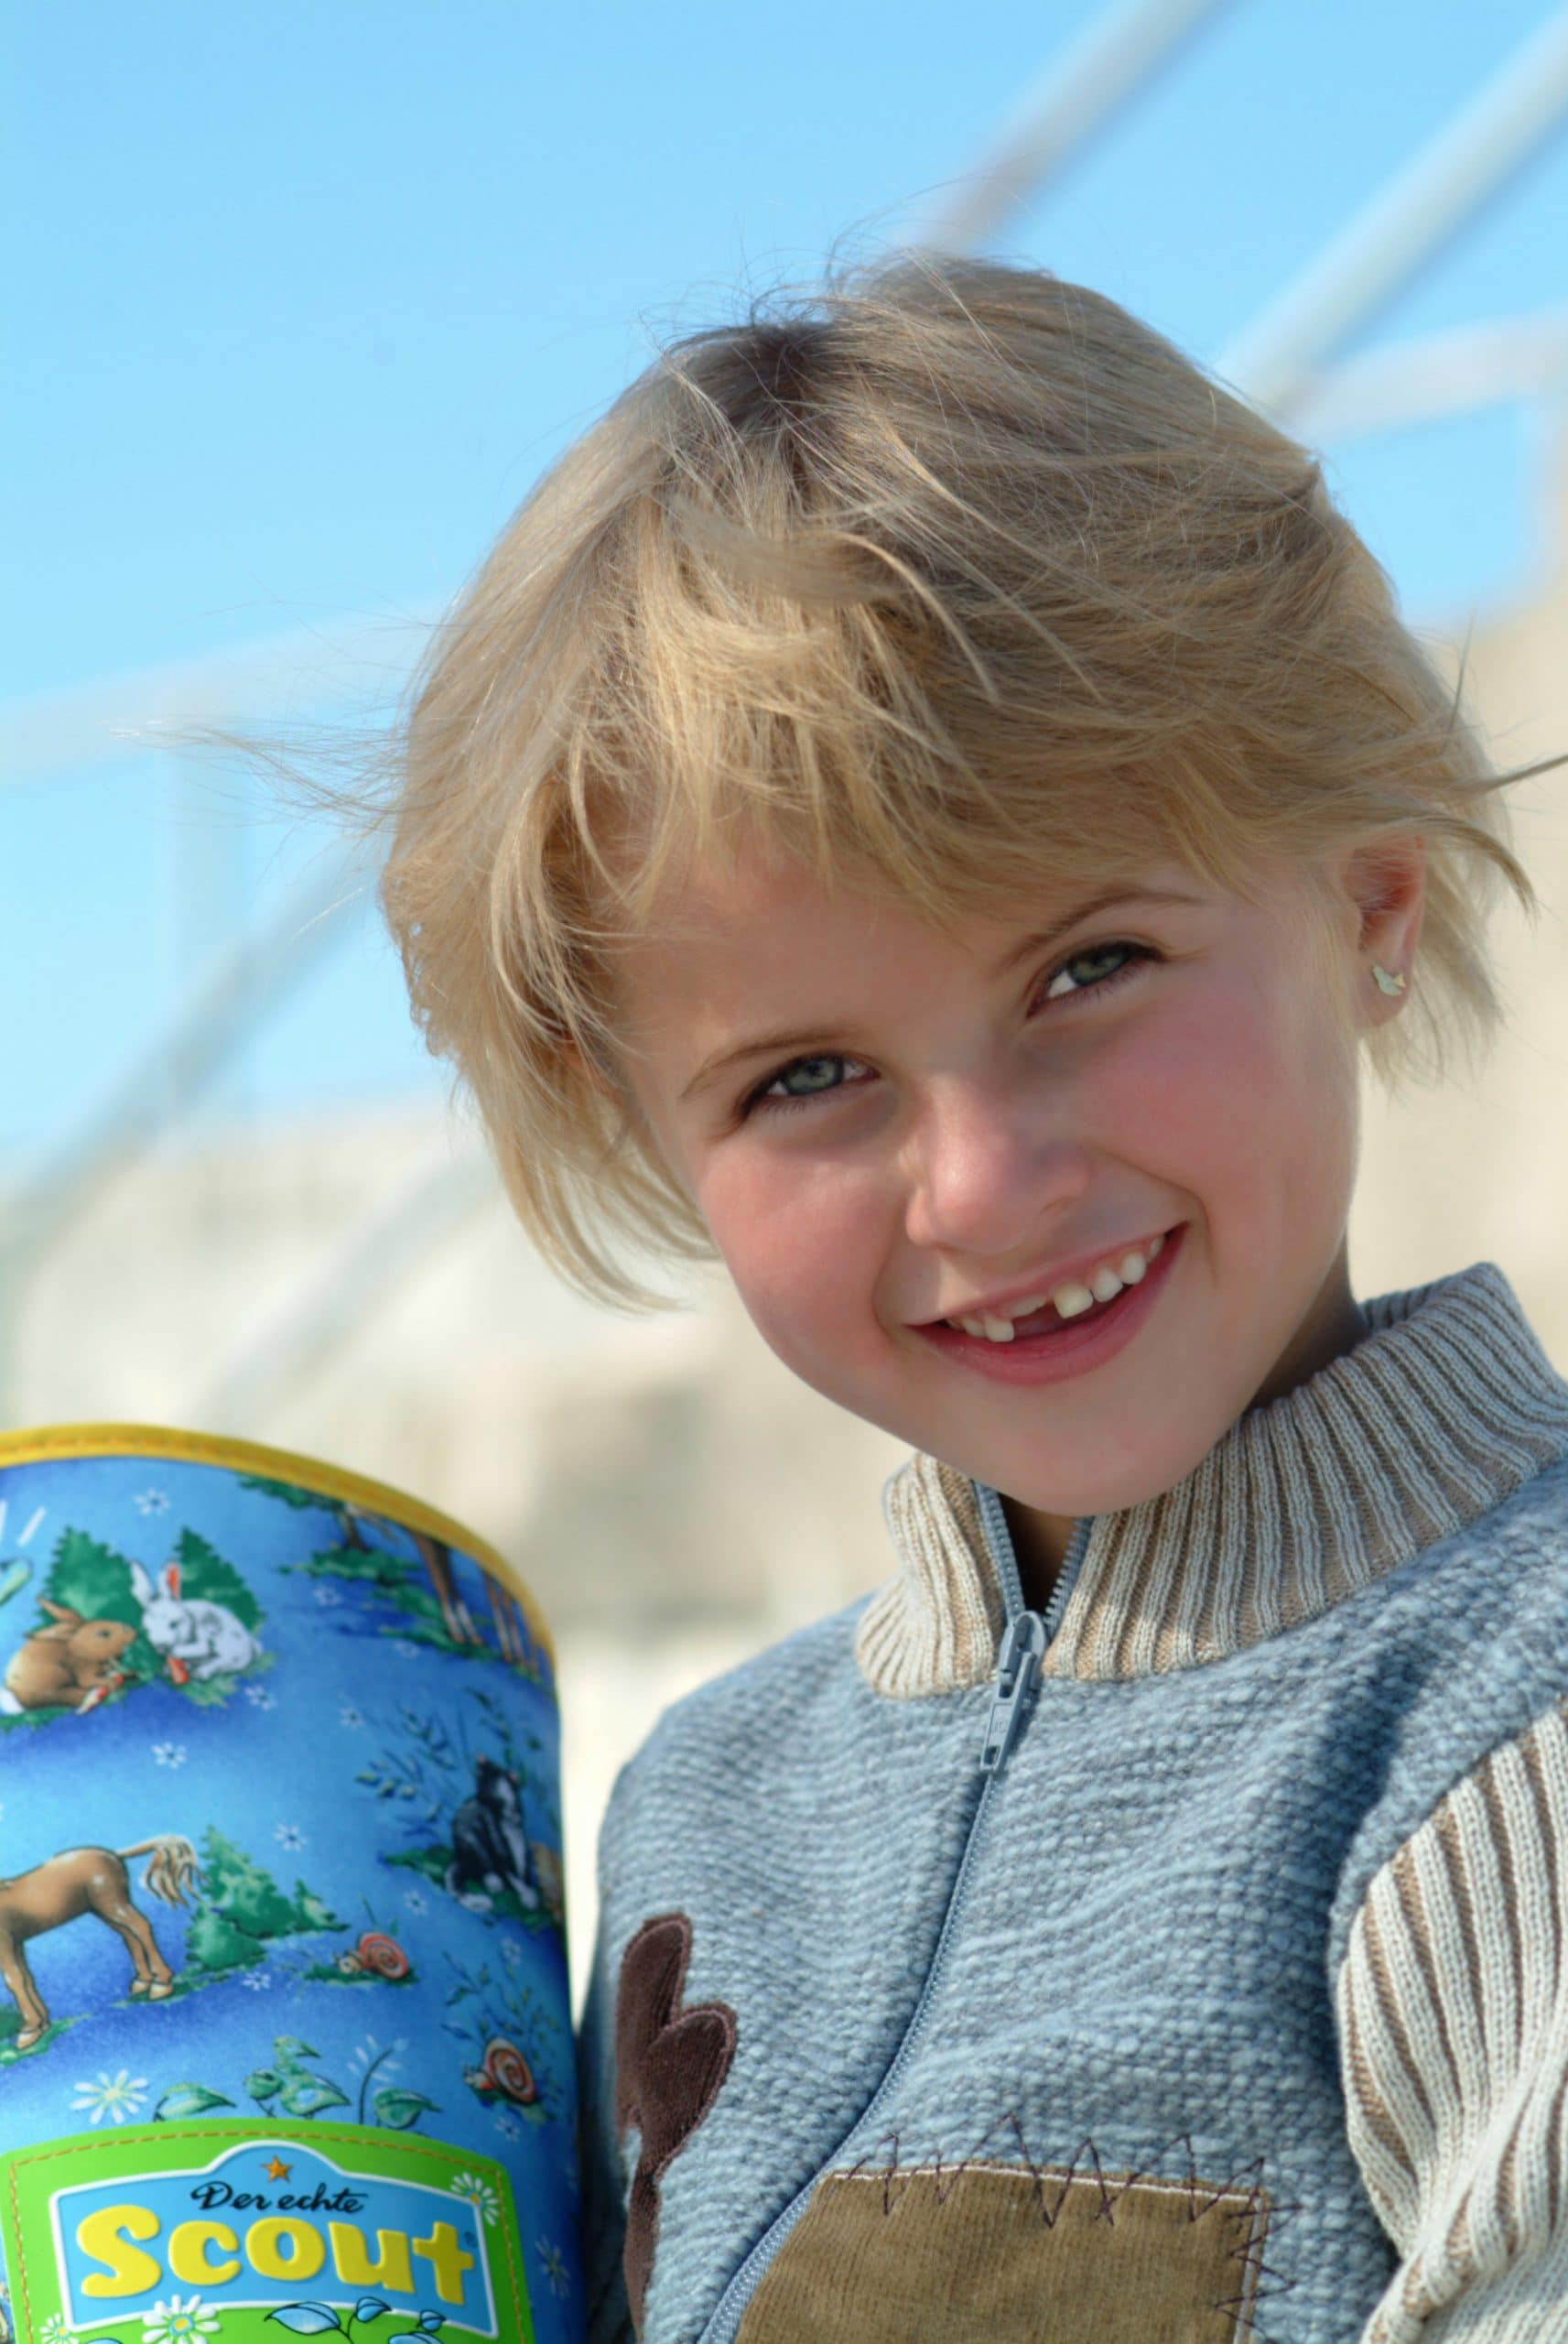 483-Schmitt-Photodesign-Kinderbilder-R2UPPZCB